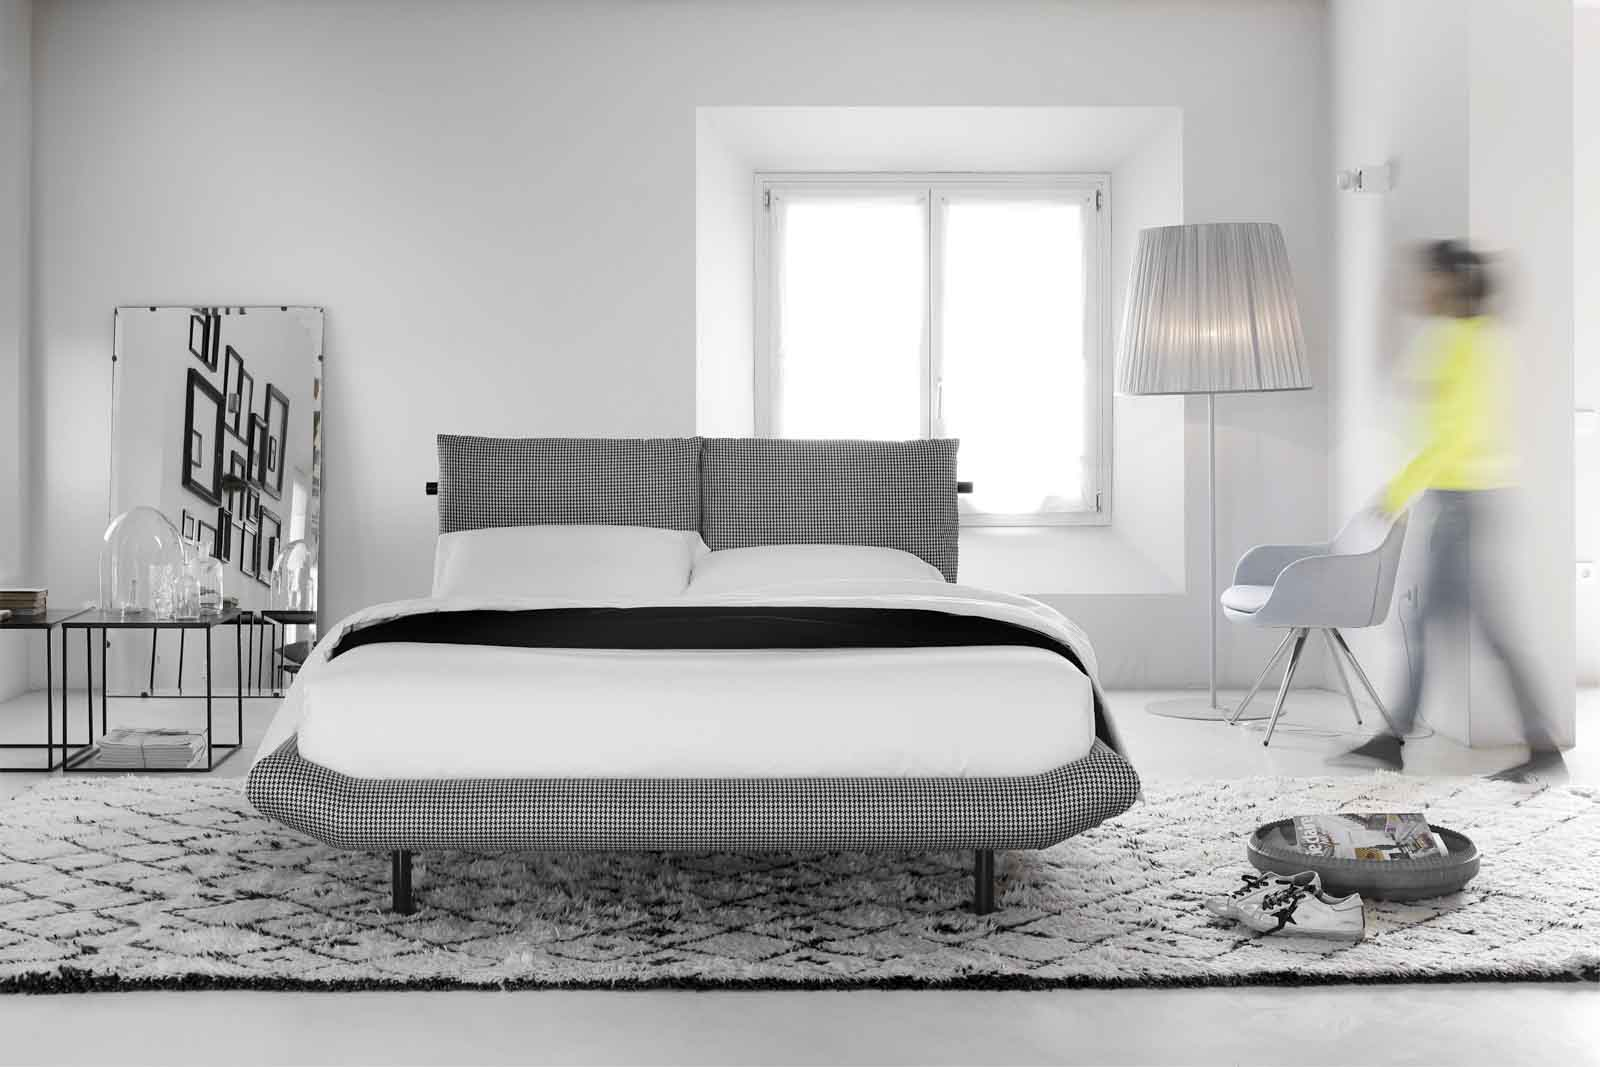 Cama Noah de Noctis en Maxim Confort Mallorca